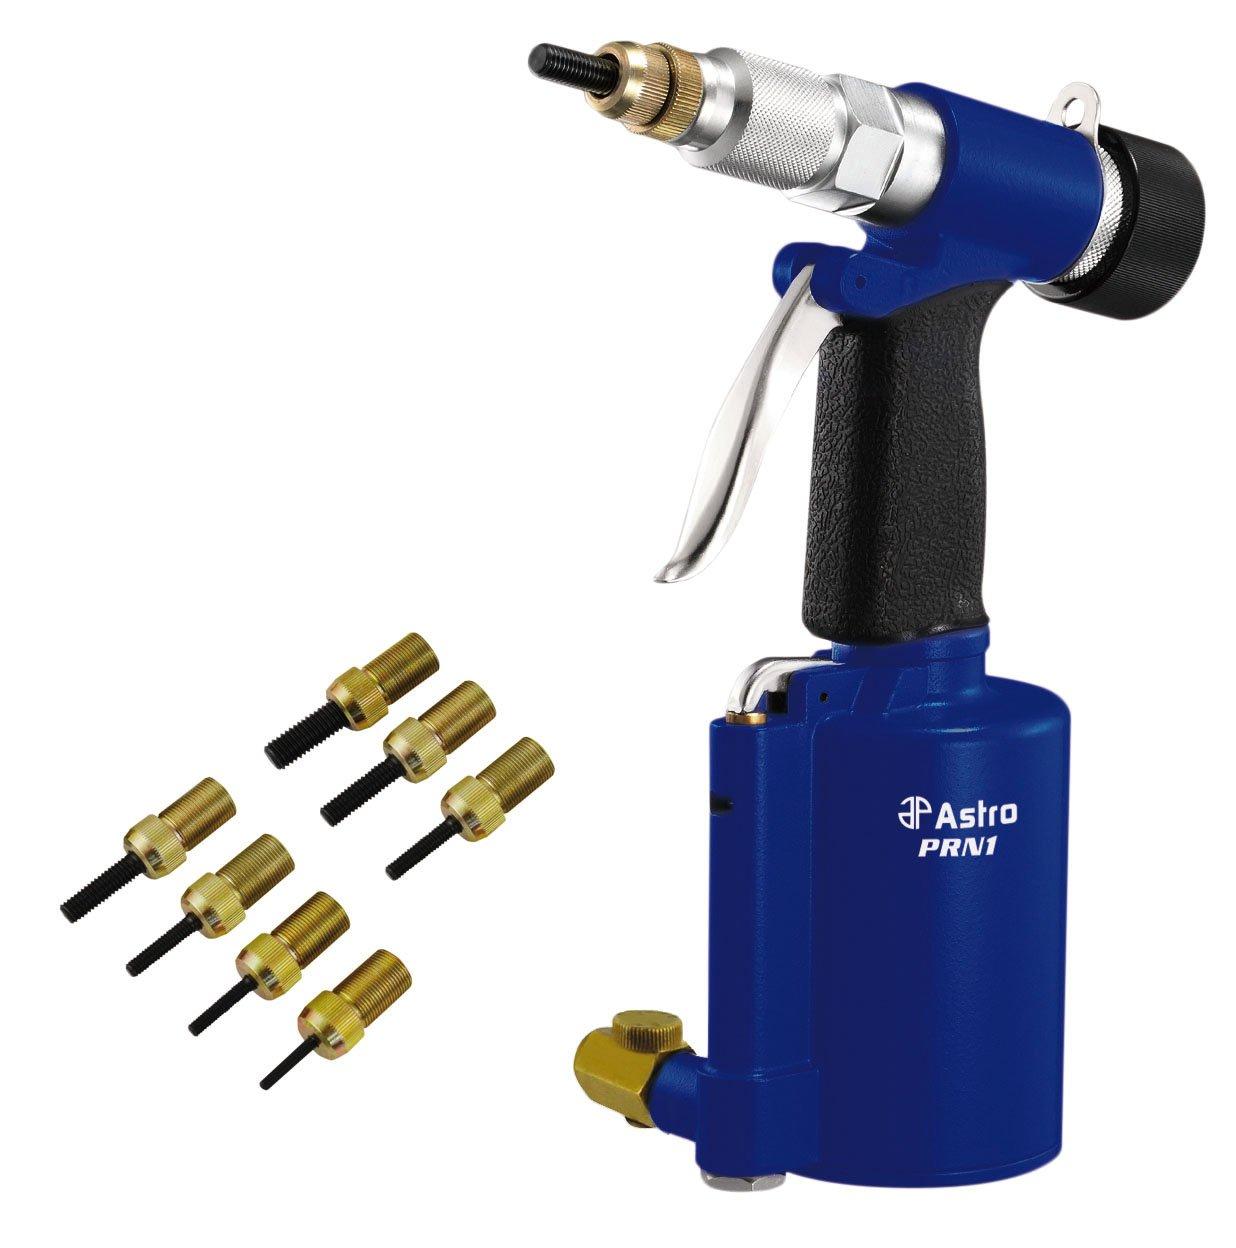 Astro Pneumatic Tool PRN1 3/8-Inch Capacity Pneumatic Rivet Nut Setting Kit - Metric & SAE